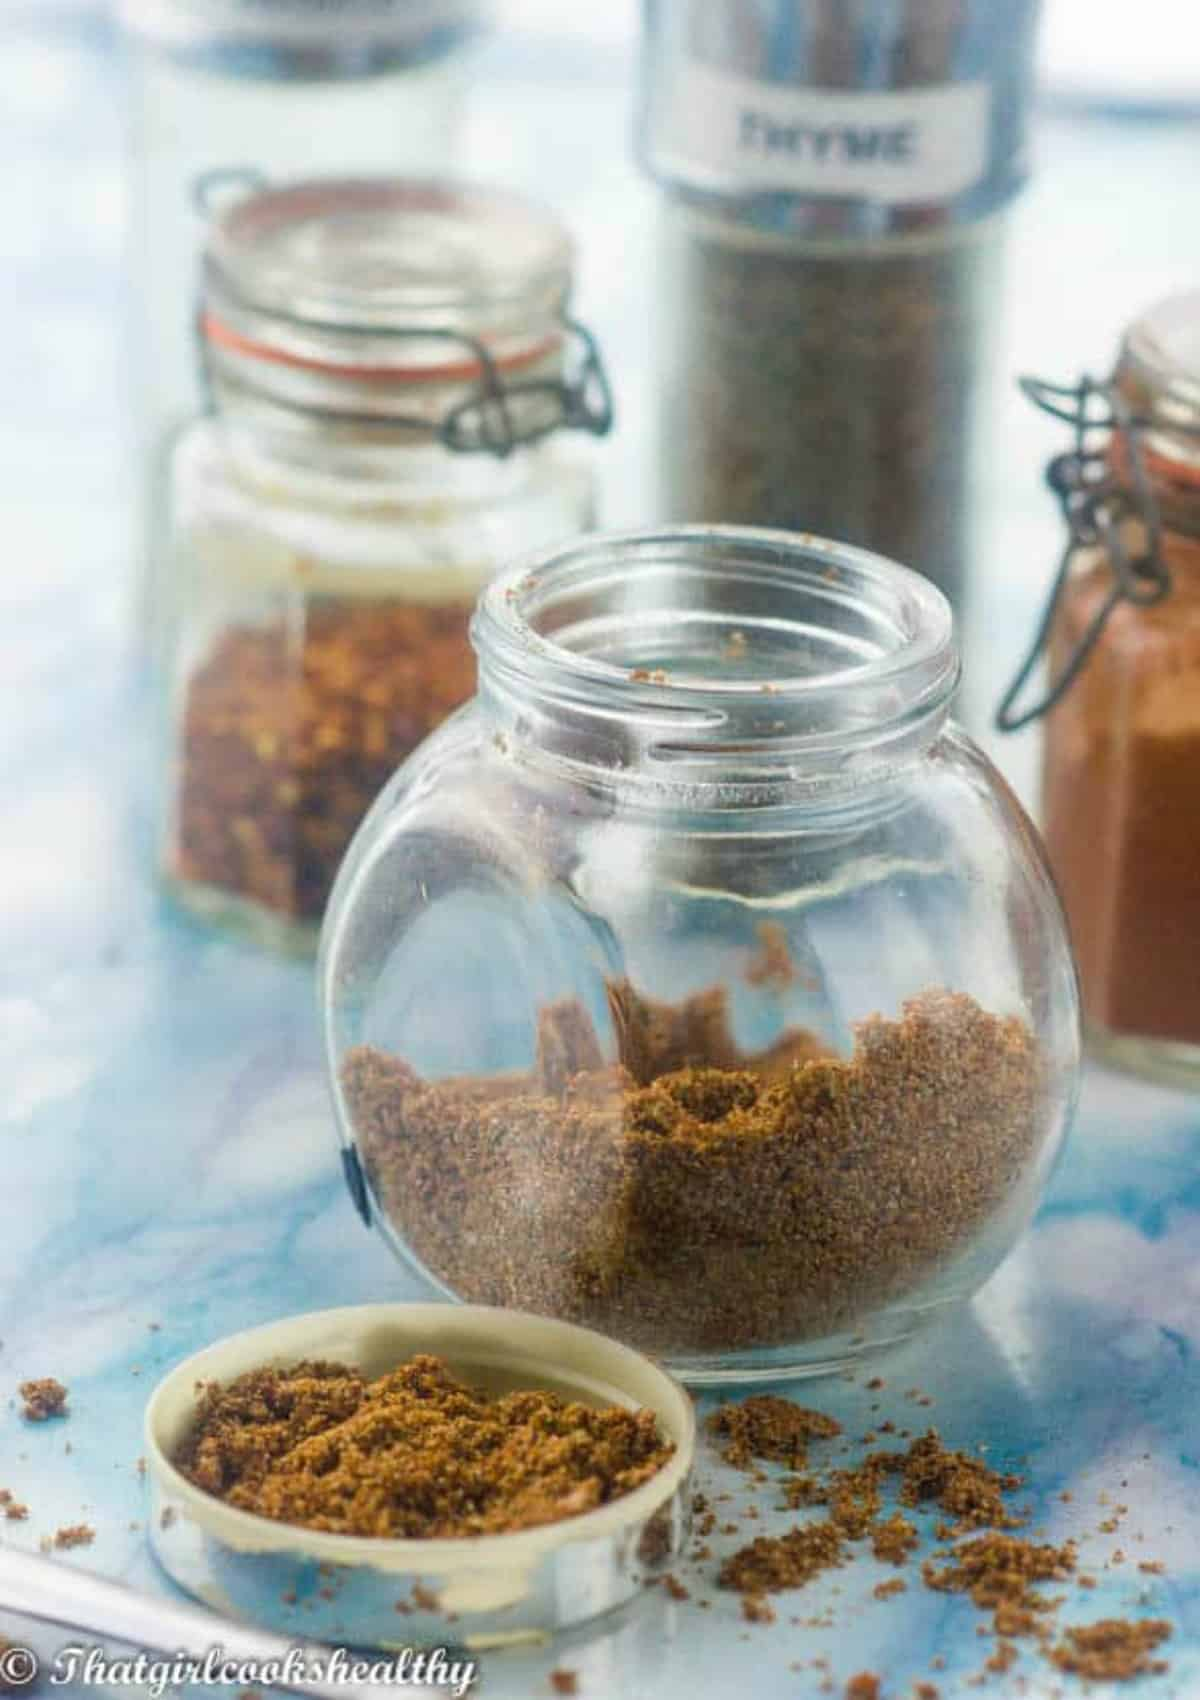 seasoning in a glass jar